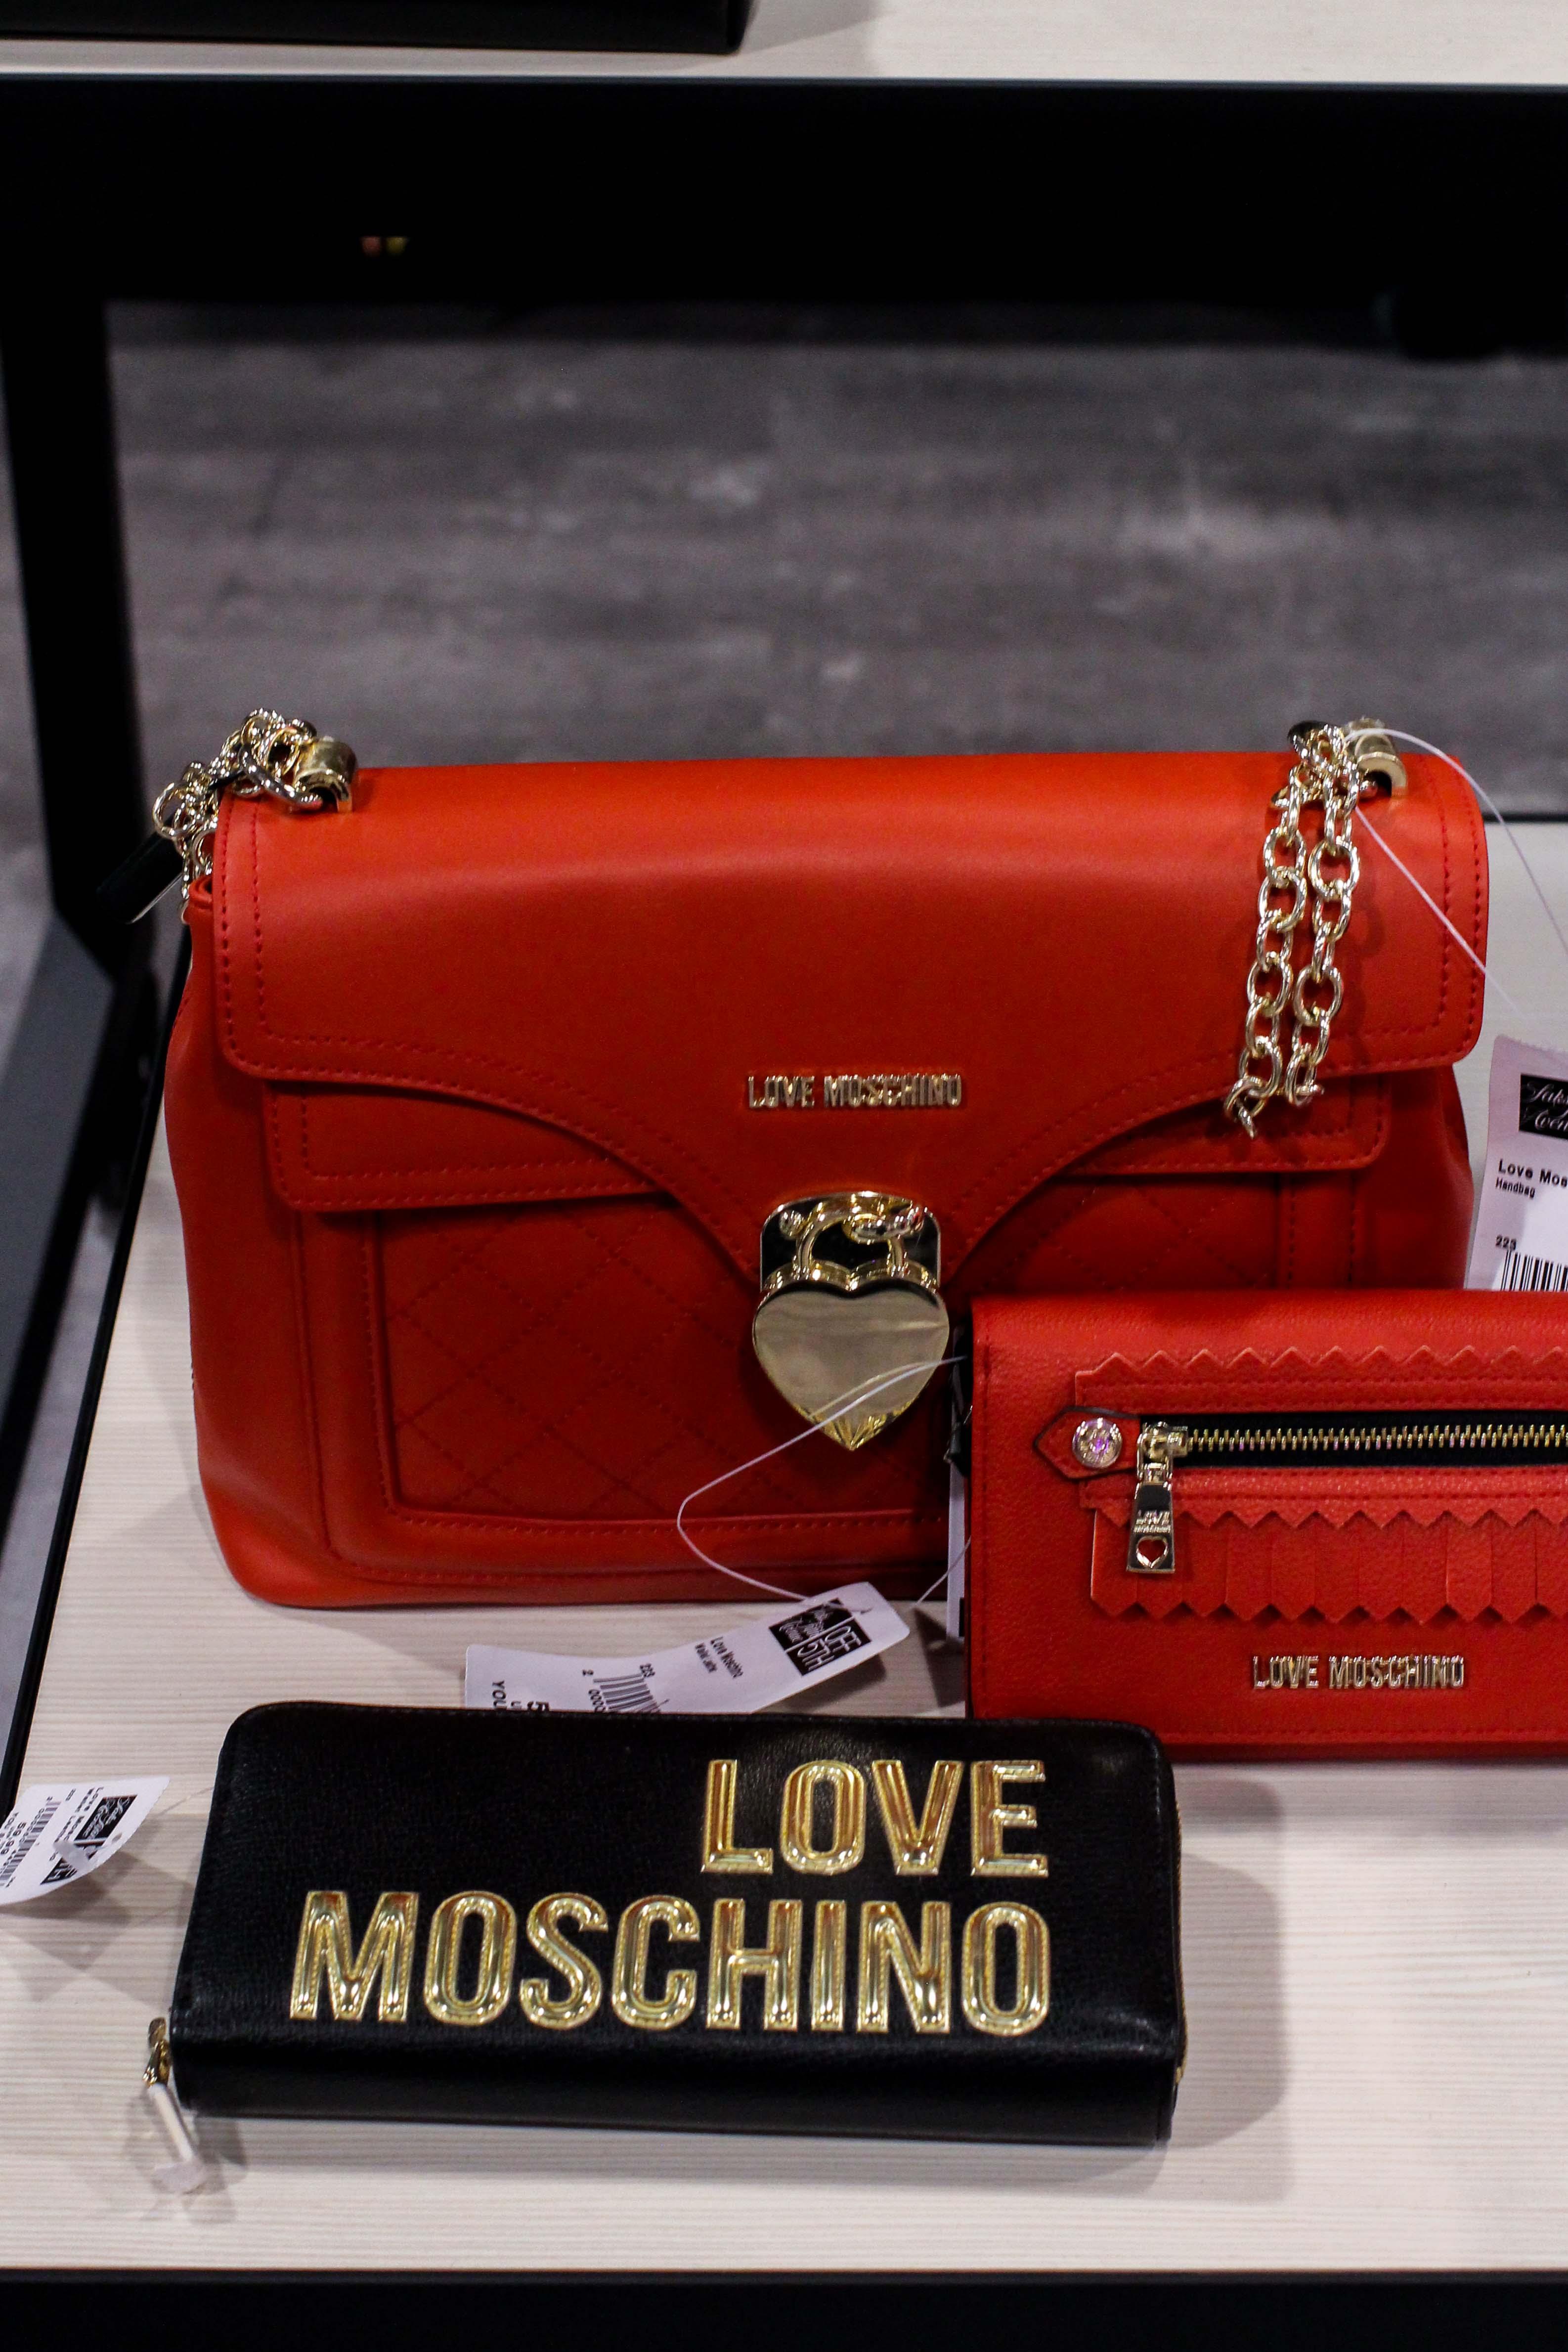 Moschino Taschen rot Store Opening Saks OFF 5th Avenue Bonn Premium-Marken Outletpreis Designer Outlet Bonn Modeblog